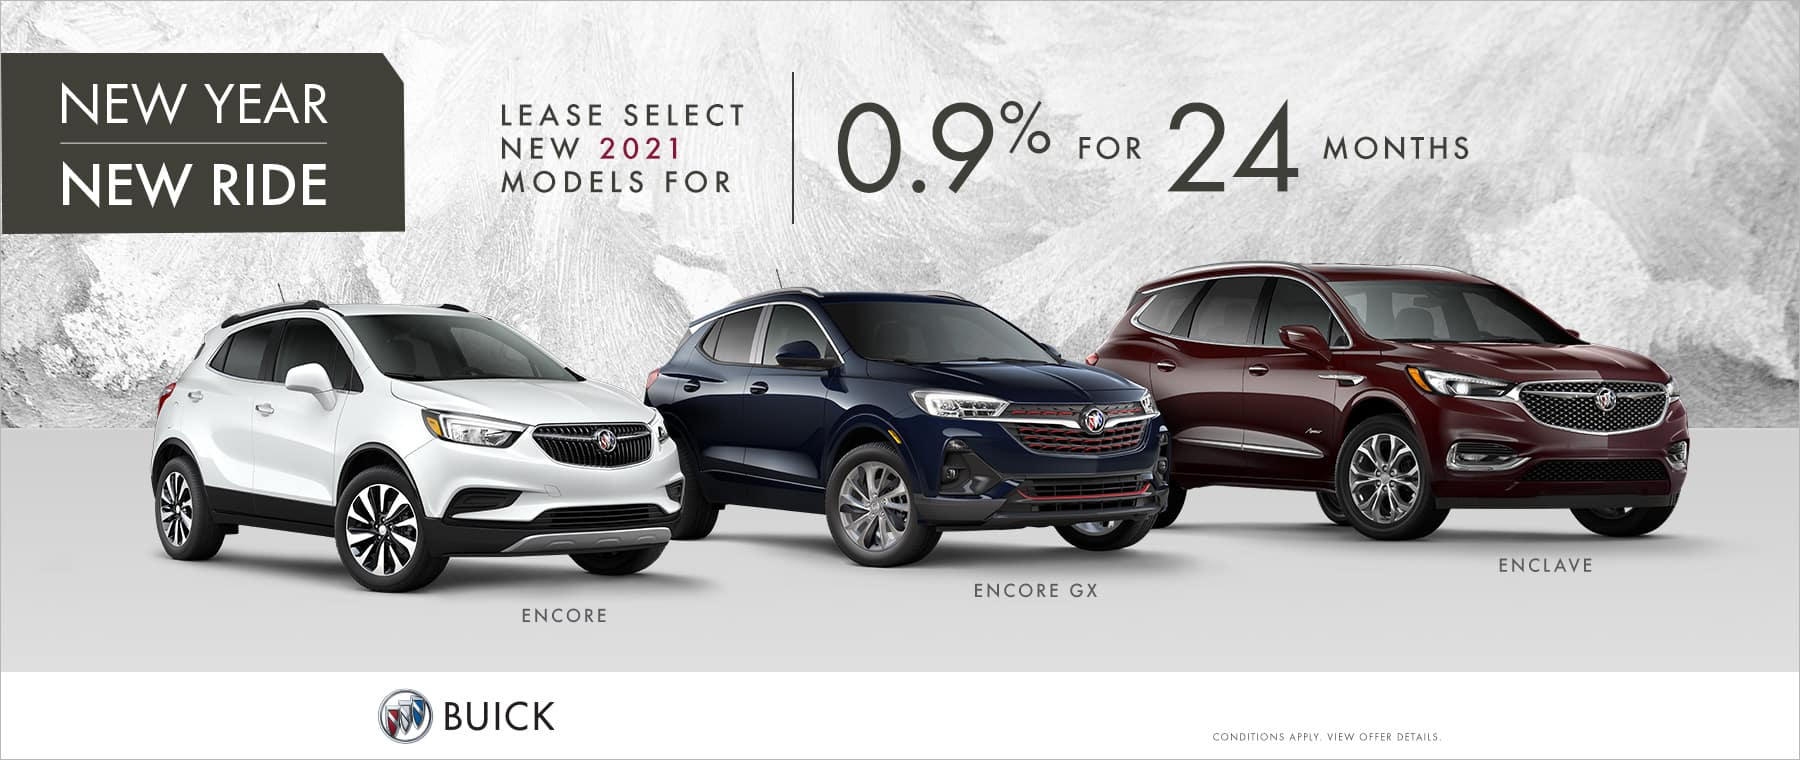 2021_JAN_CNT_Buick_T3_1800X760_LINEUP